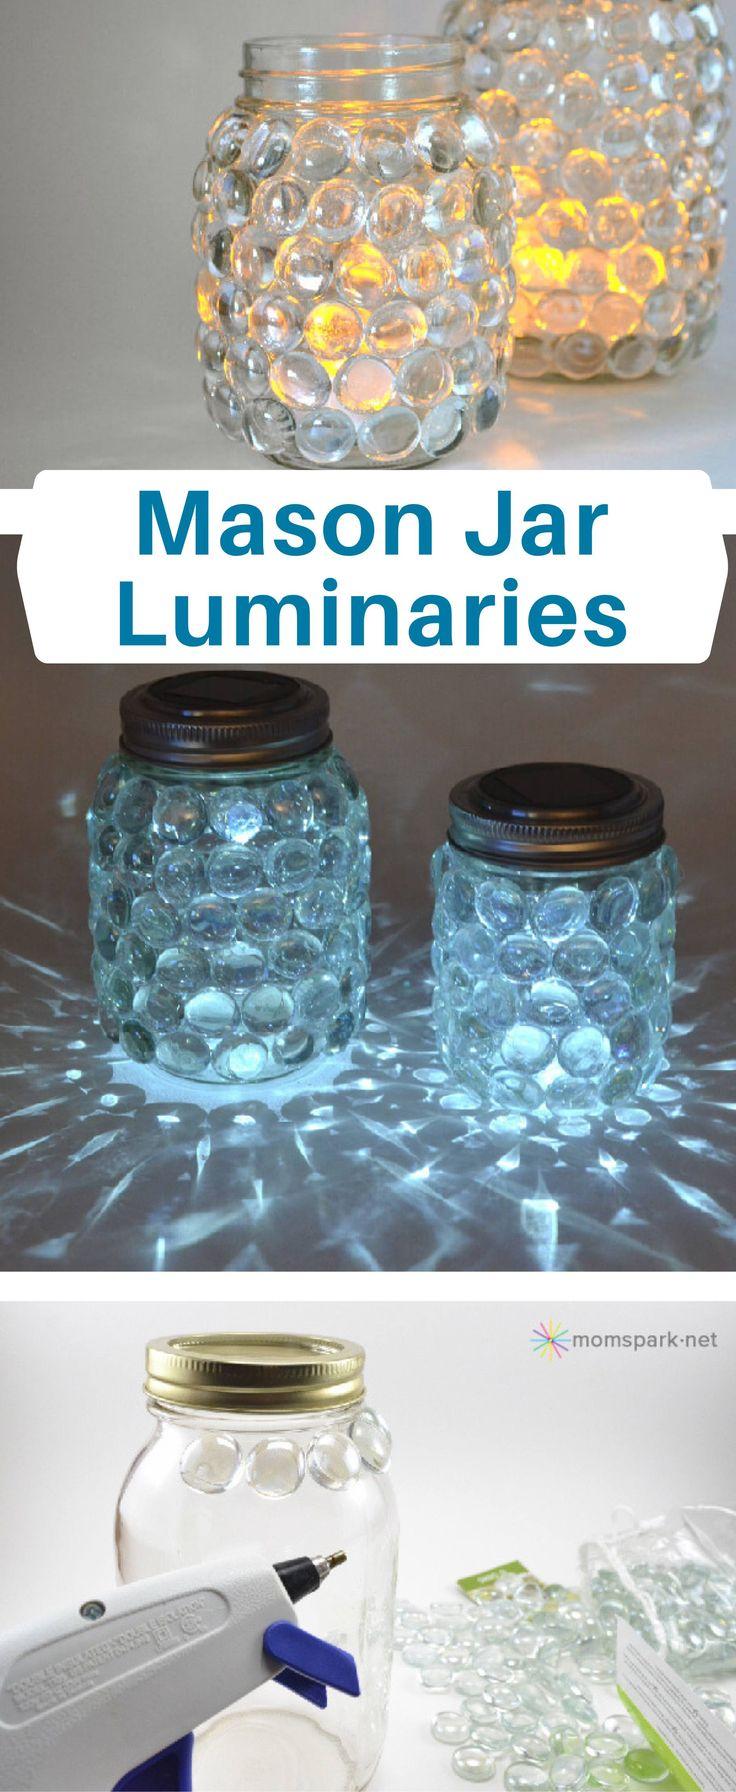 Mason Jar Luminaries | Create a mason jar luminary - similar to a scatter candle - the easy way.